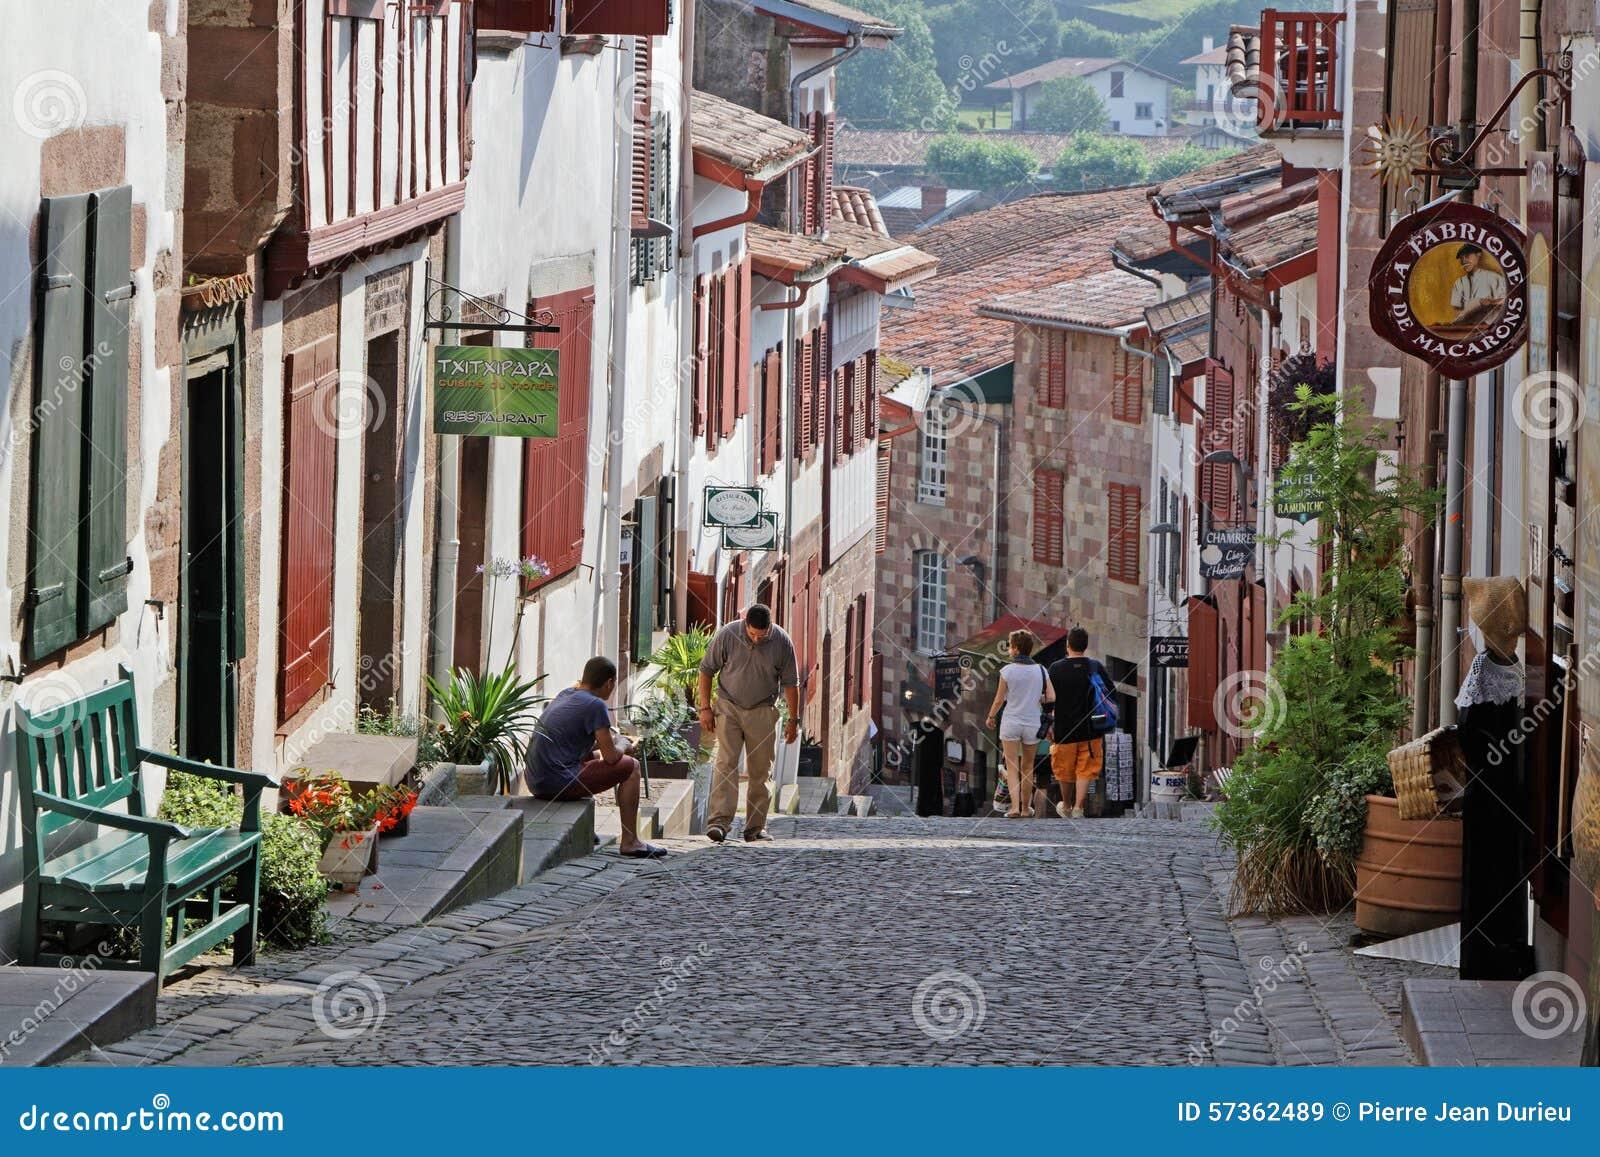 A street in saint jean pied de port editorial stock image - St jean pied de port to santiago distance ...